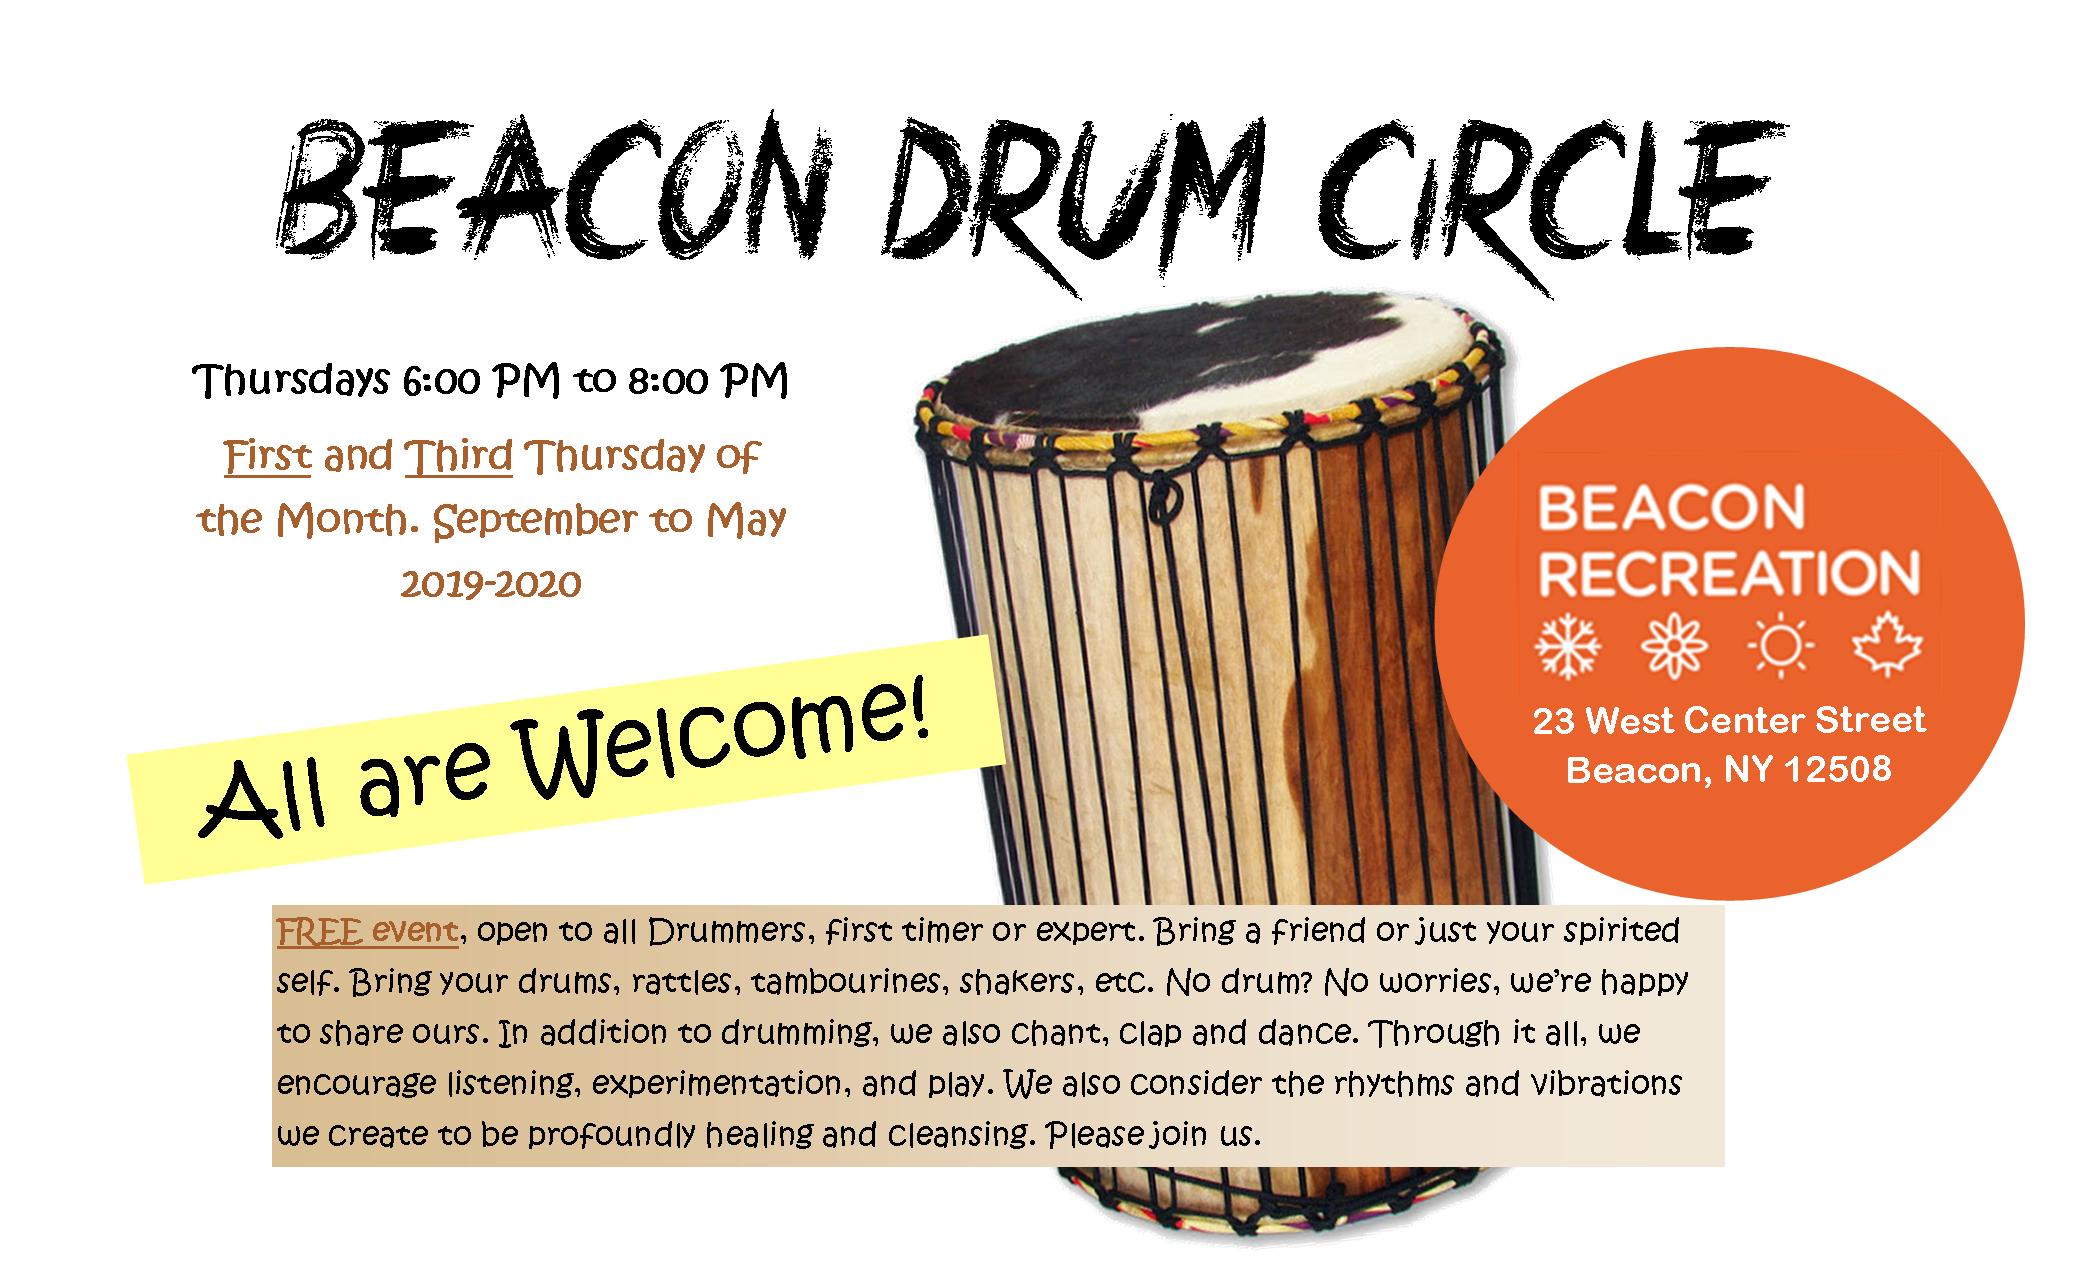 Thursday Night Beacon Drum Circle